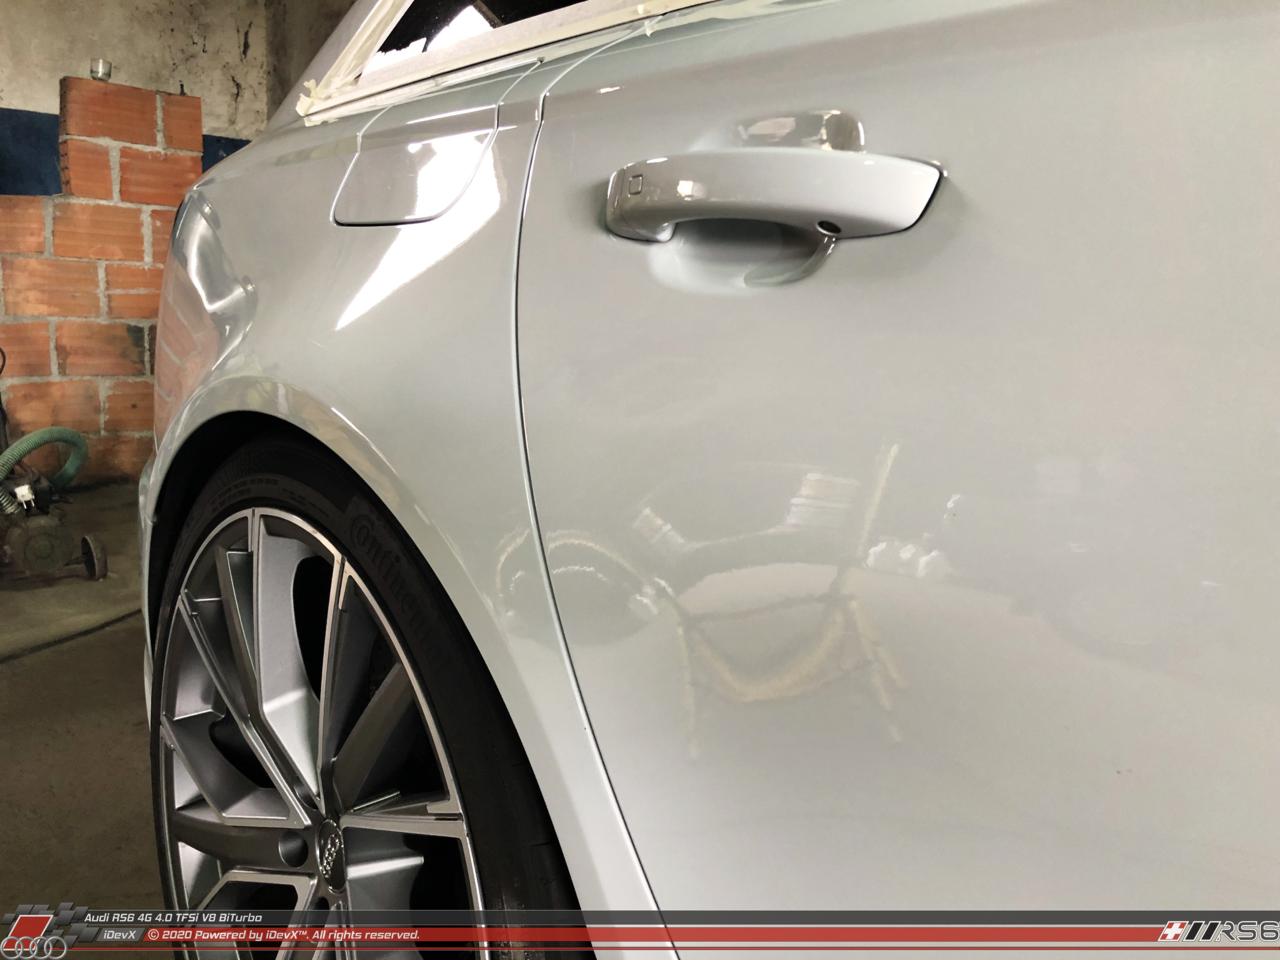 05_08.2019_Audi-RS6_iDevX_032.png